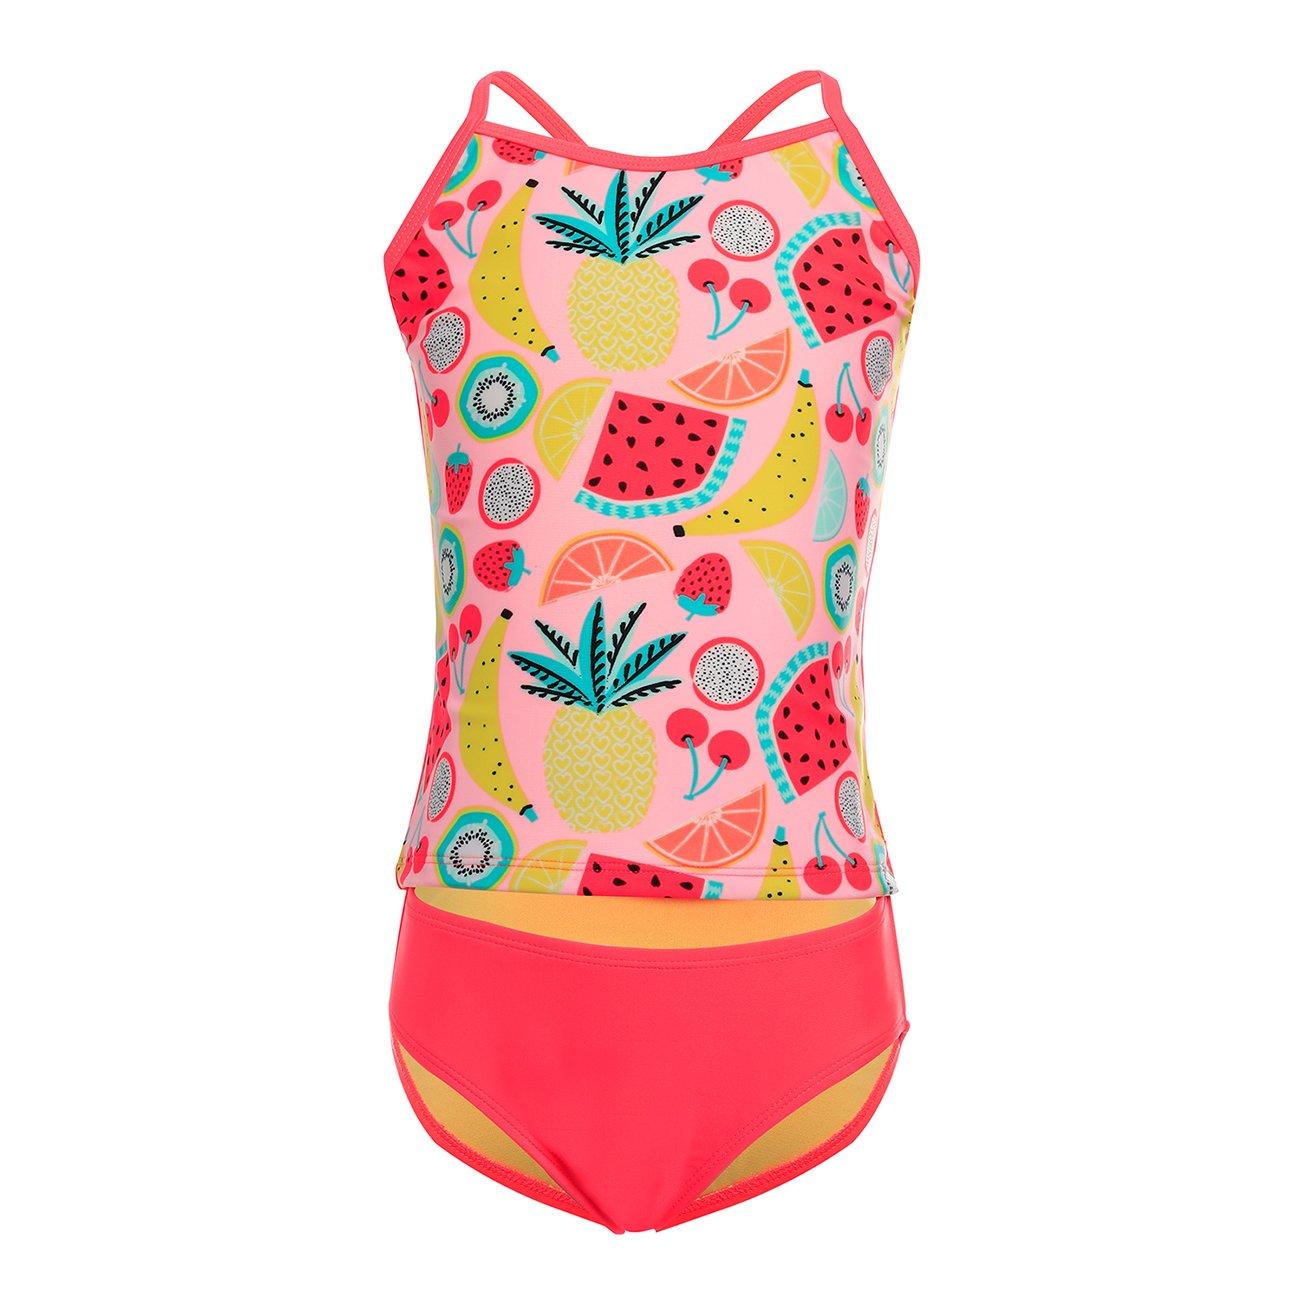 DAYU Girls Bathing Suit Swimsuit Pegasus/Pineapple/Mermaid Printed Swimwear Kids Beachwear Tankini -Age 4-14